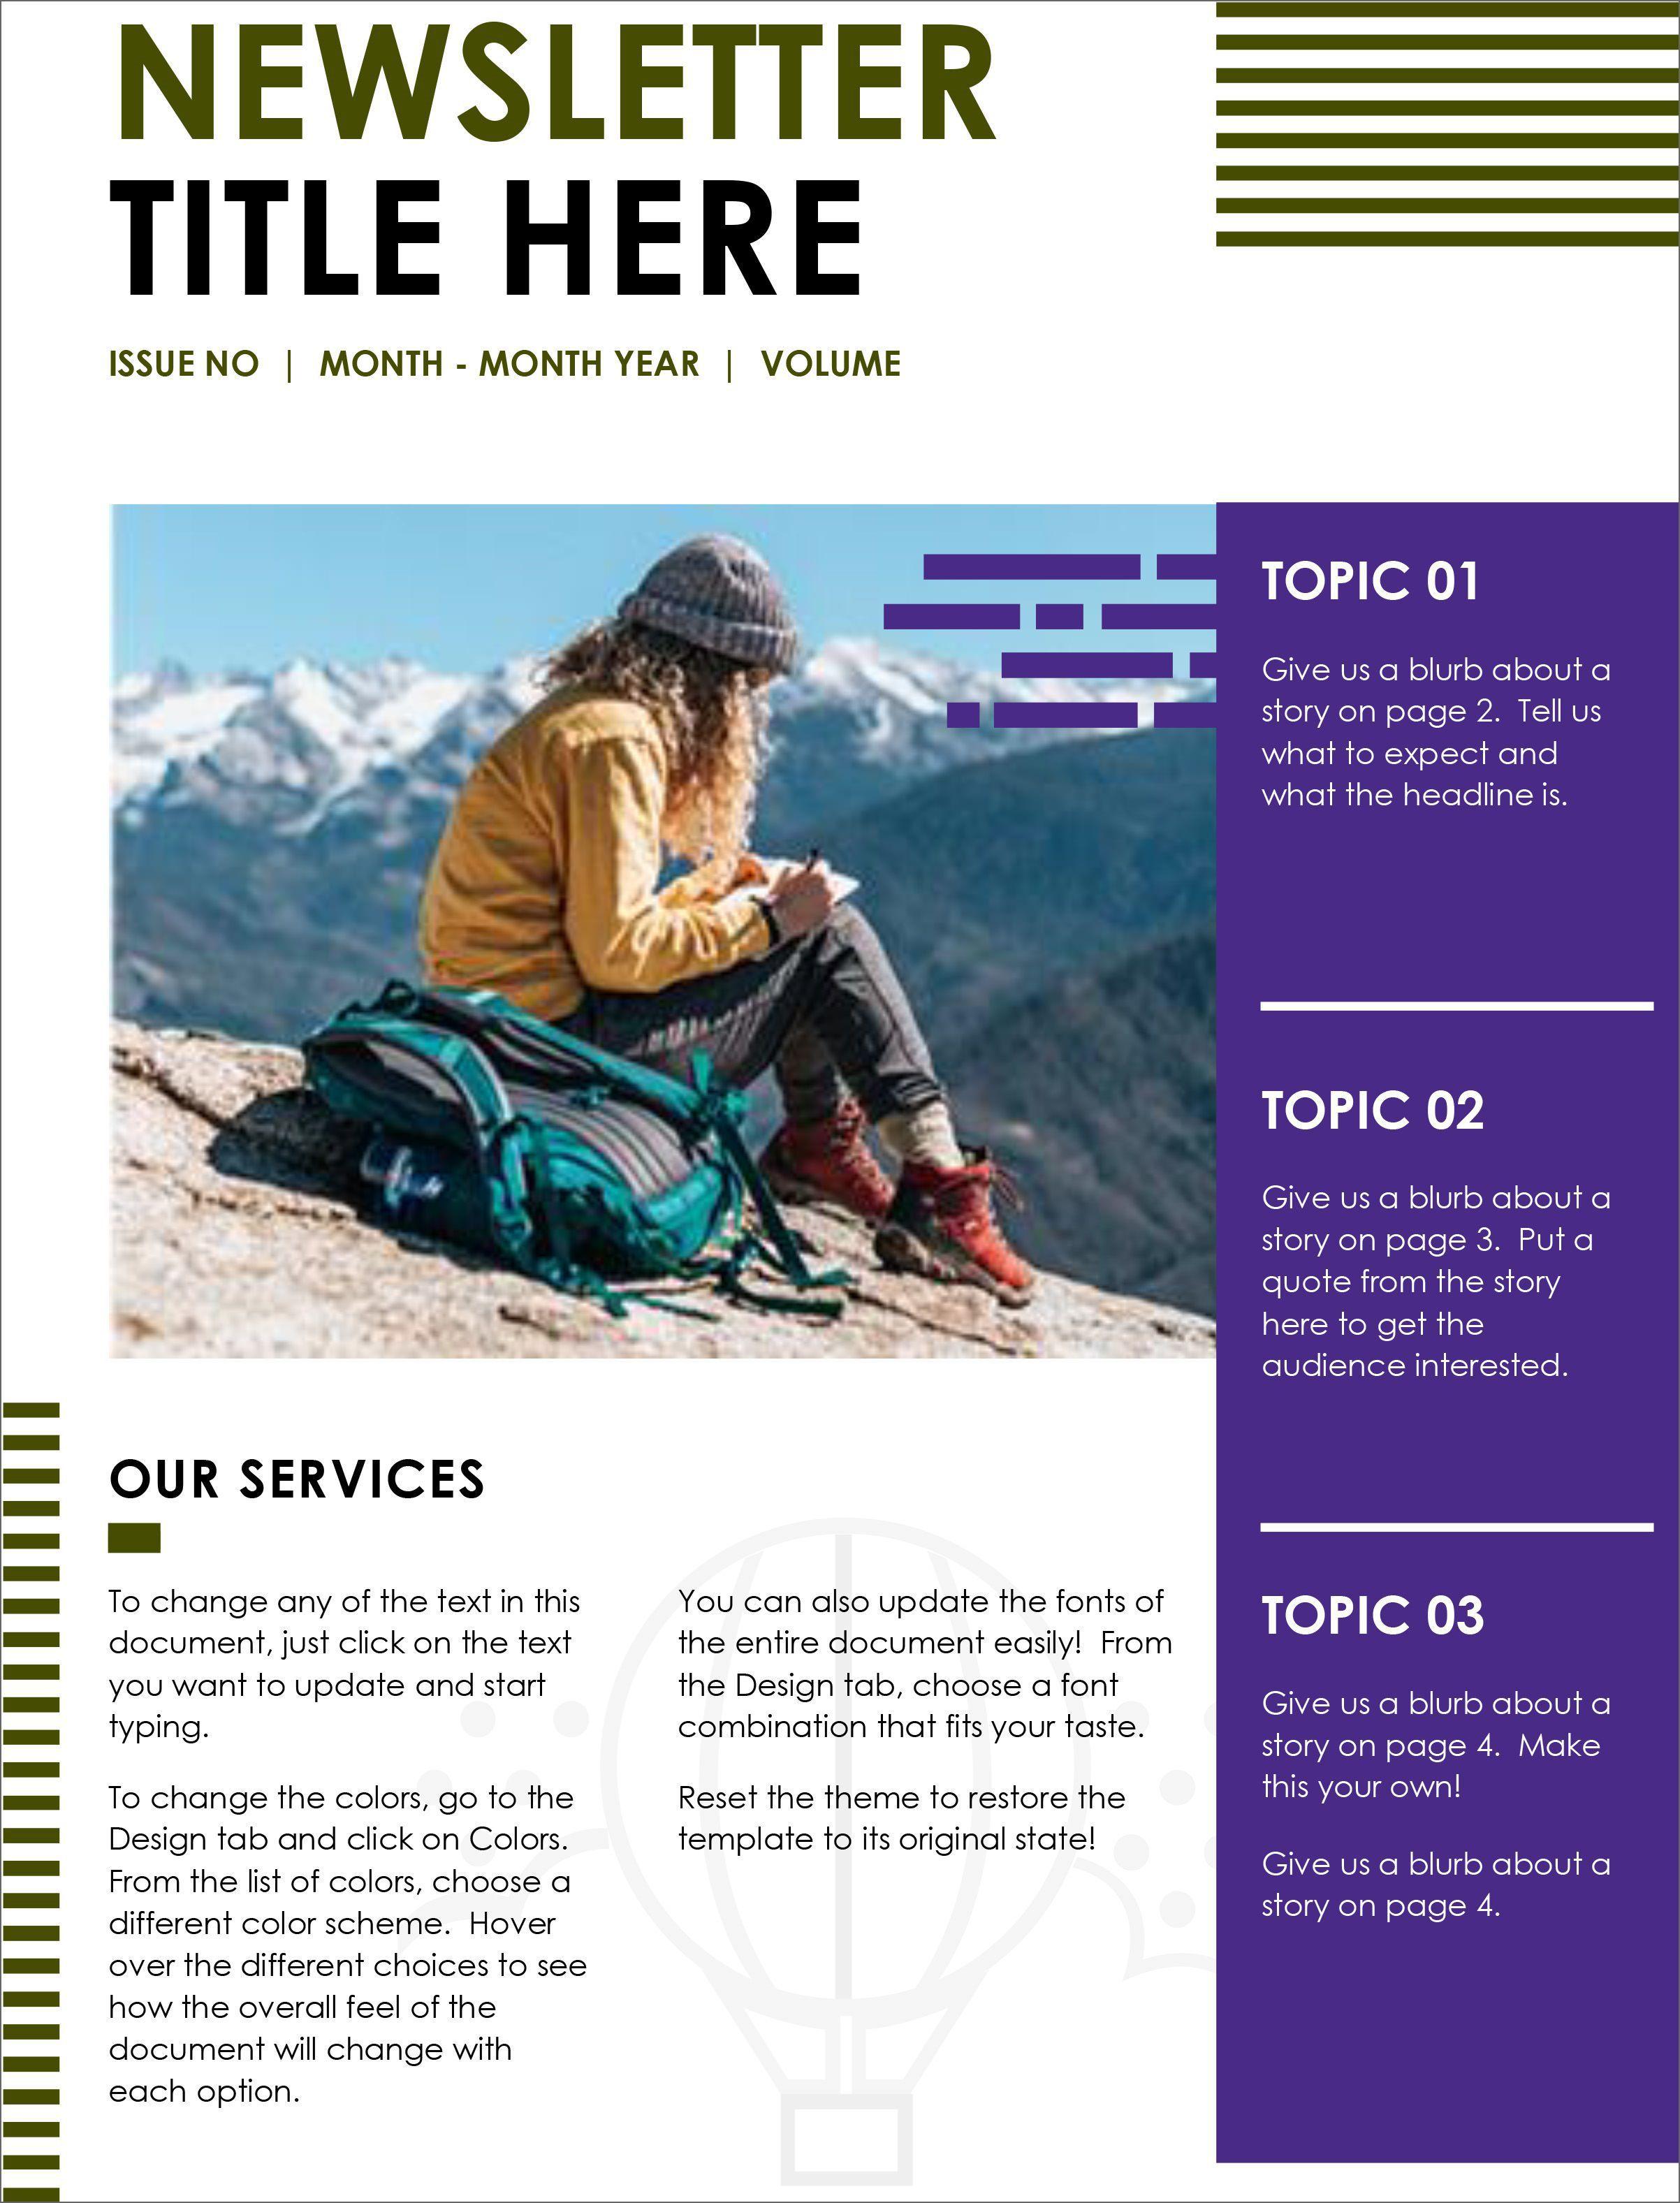 004 Singular Word Newsletter Template Free Download Highest Quality  Document M 2007 DesignFull